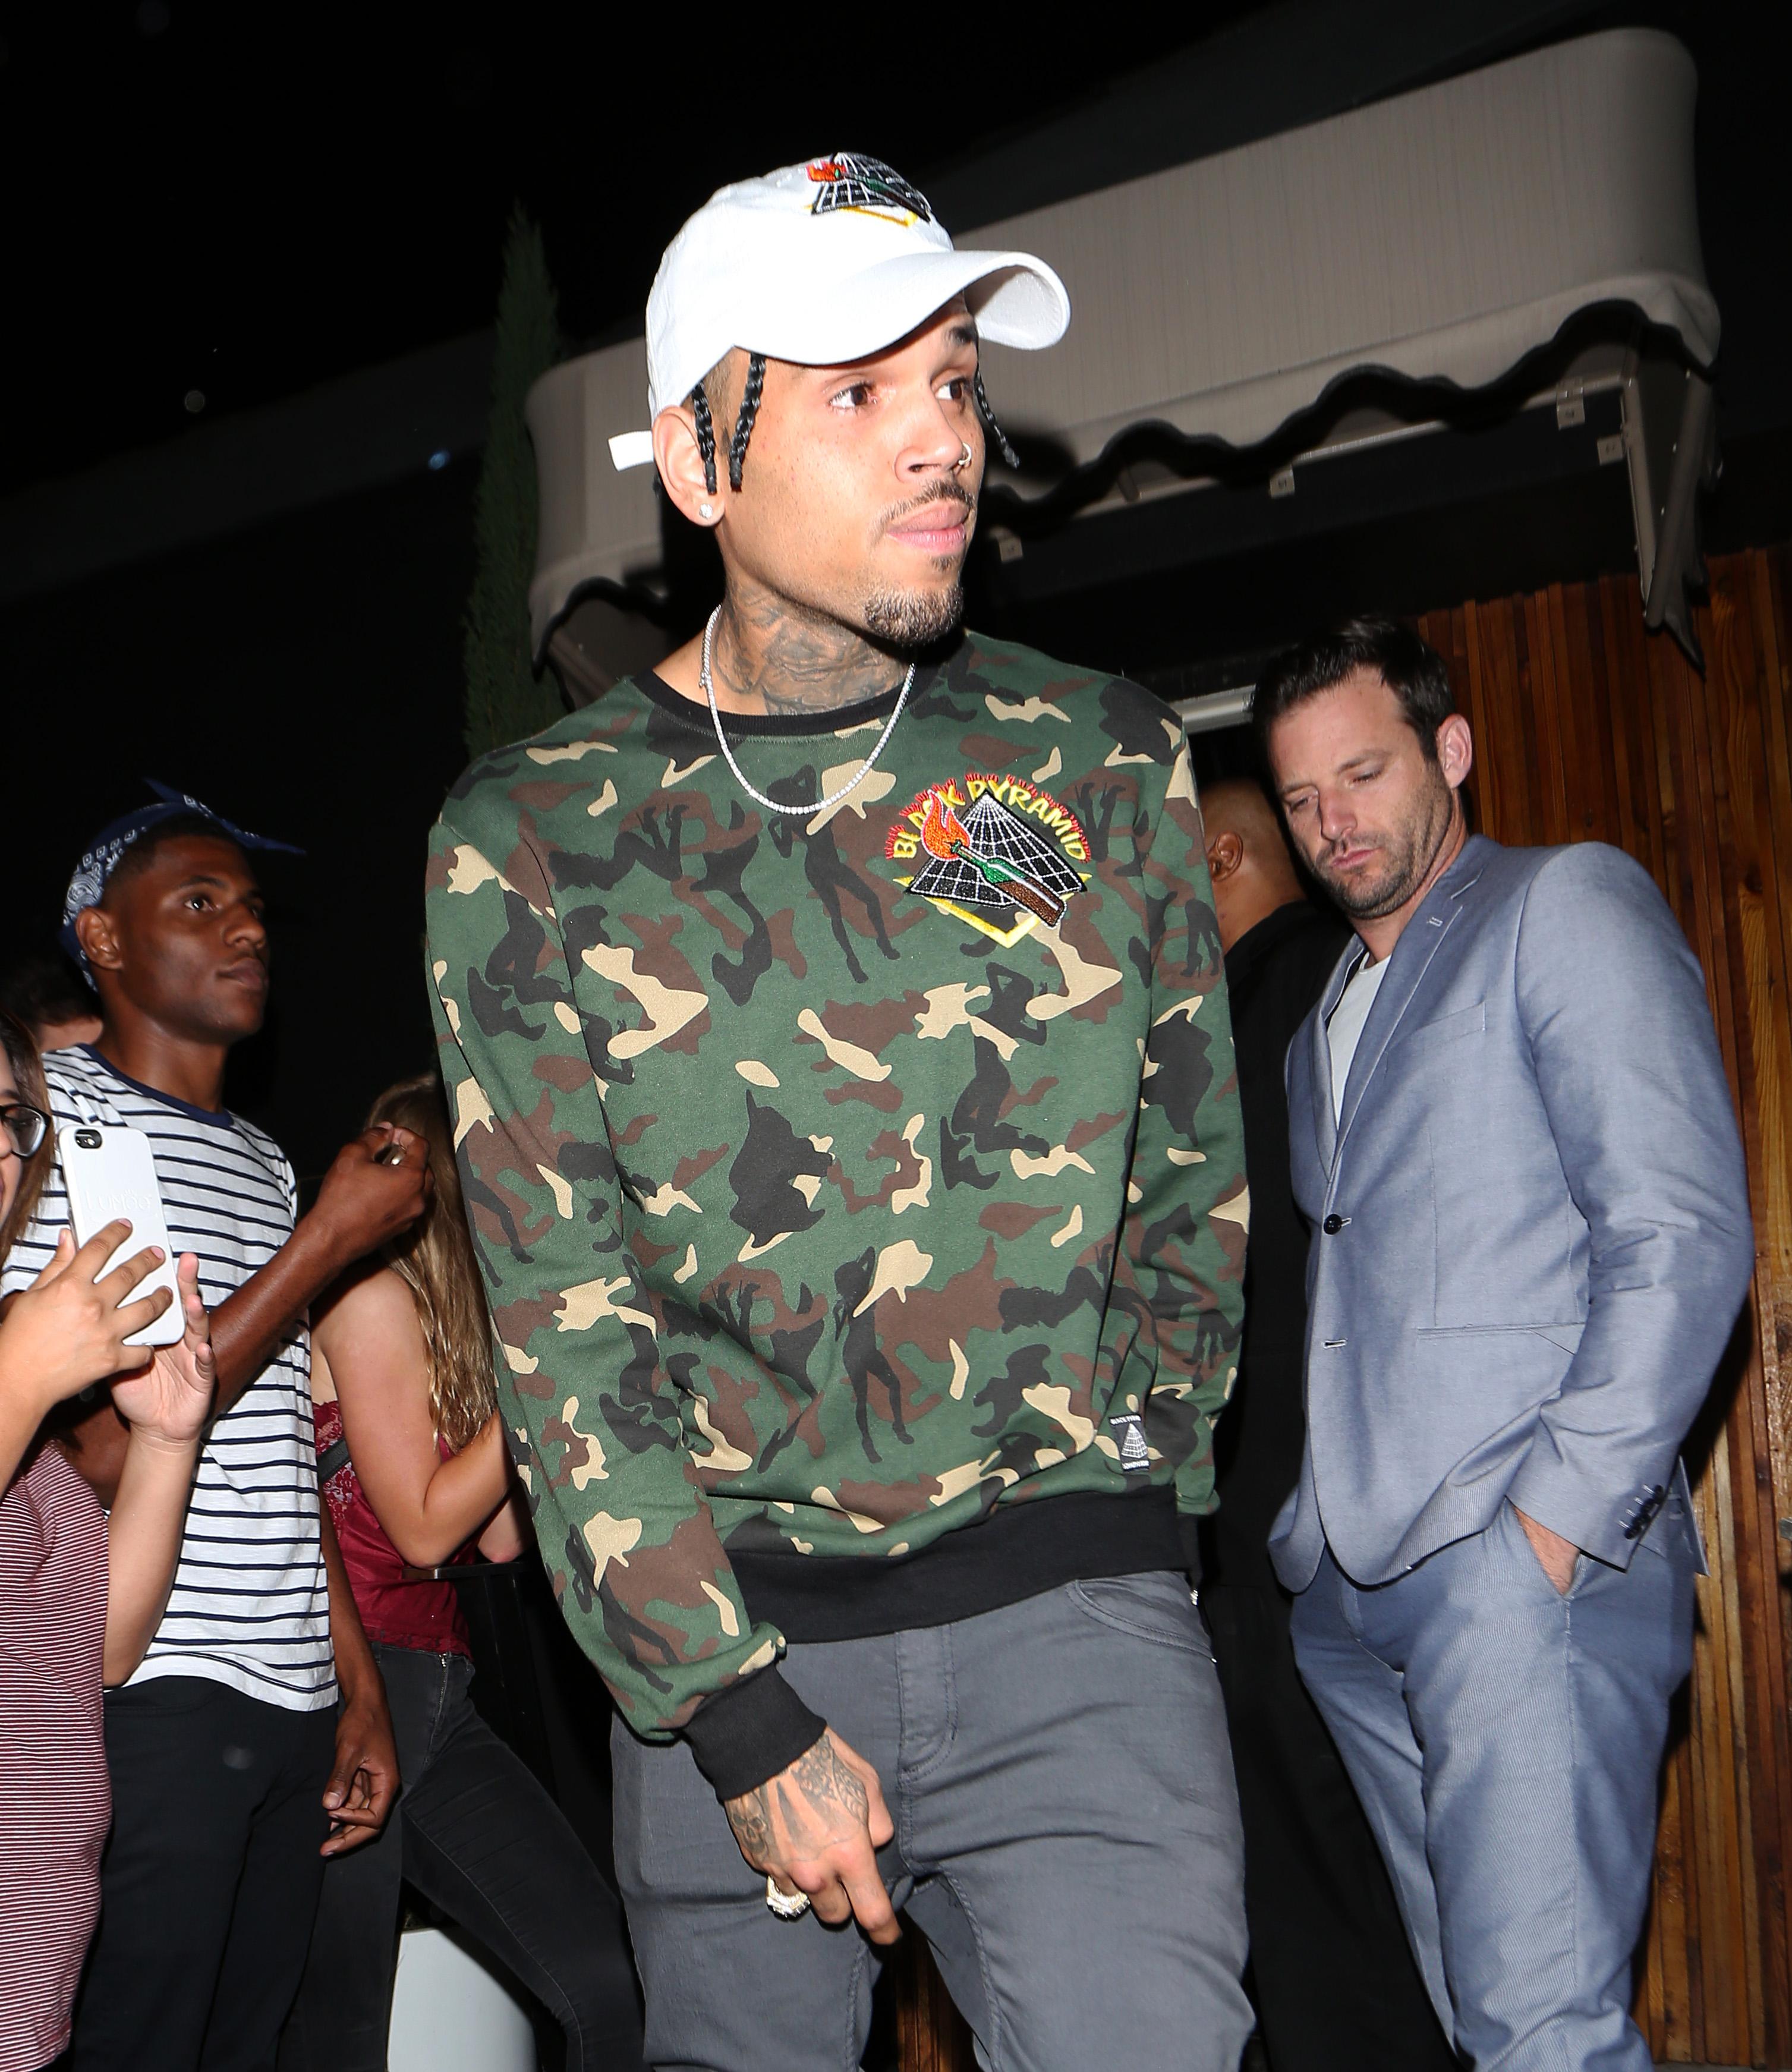 Chris Brown has a history of violence (Photo: Splash News)